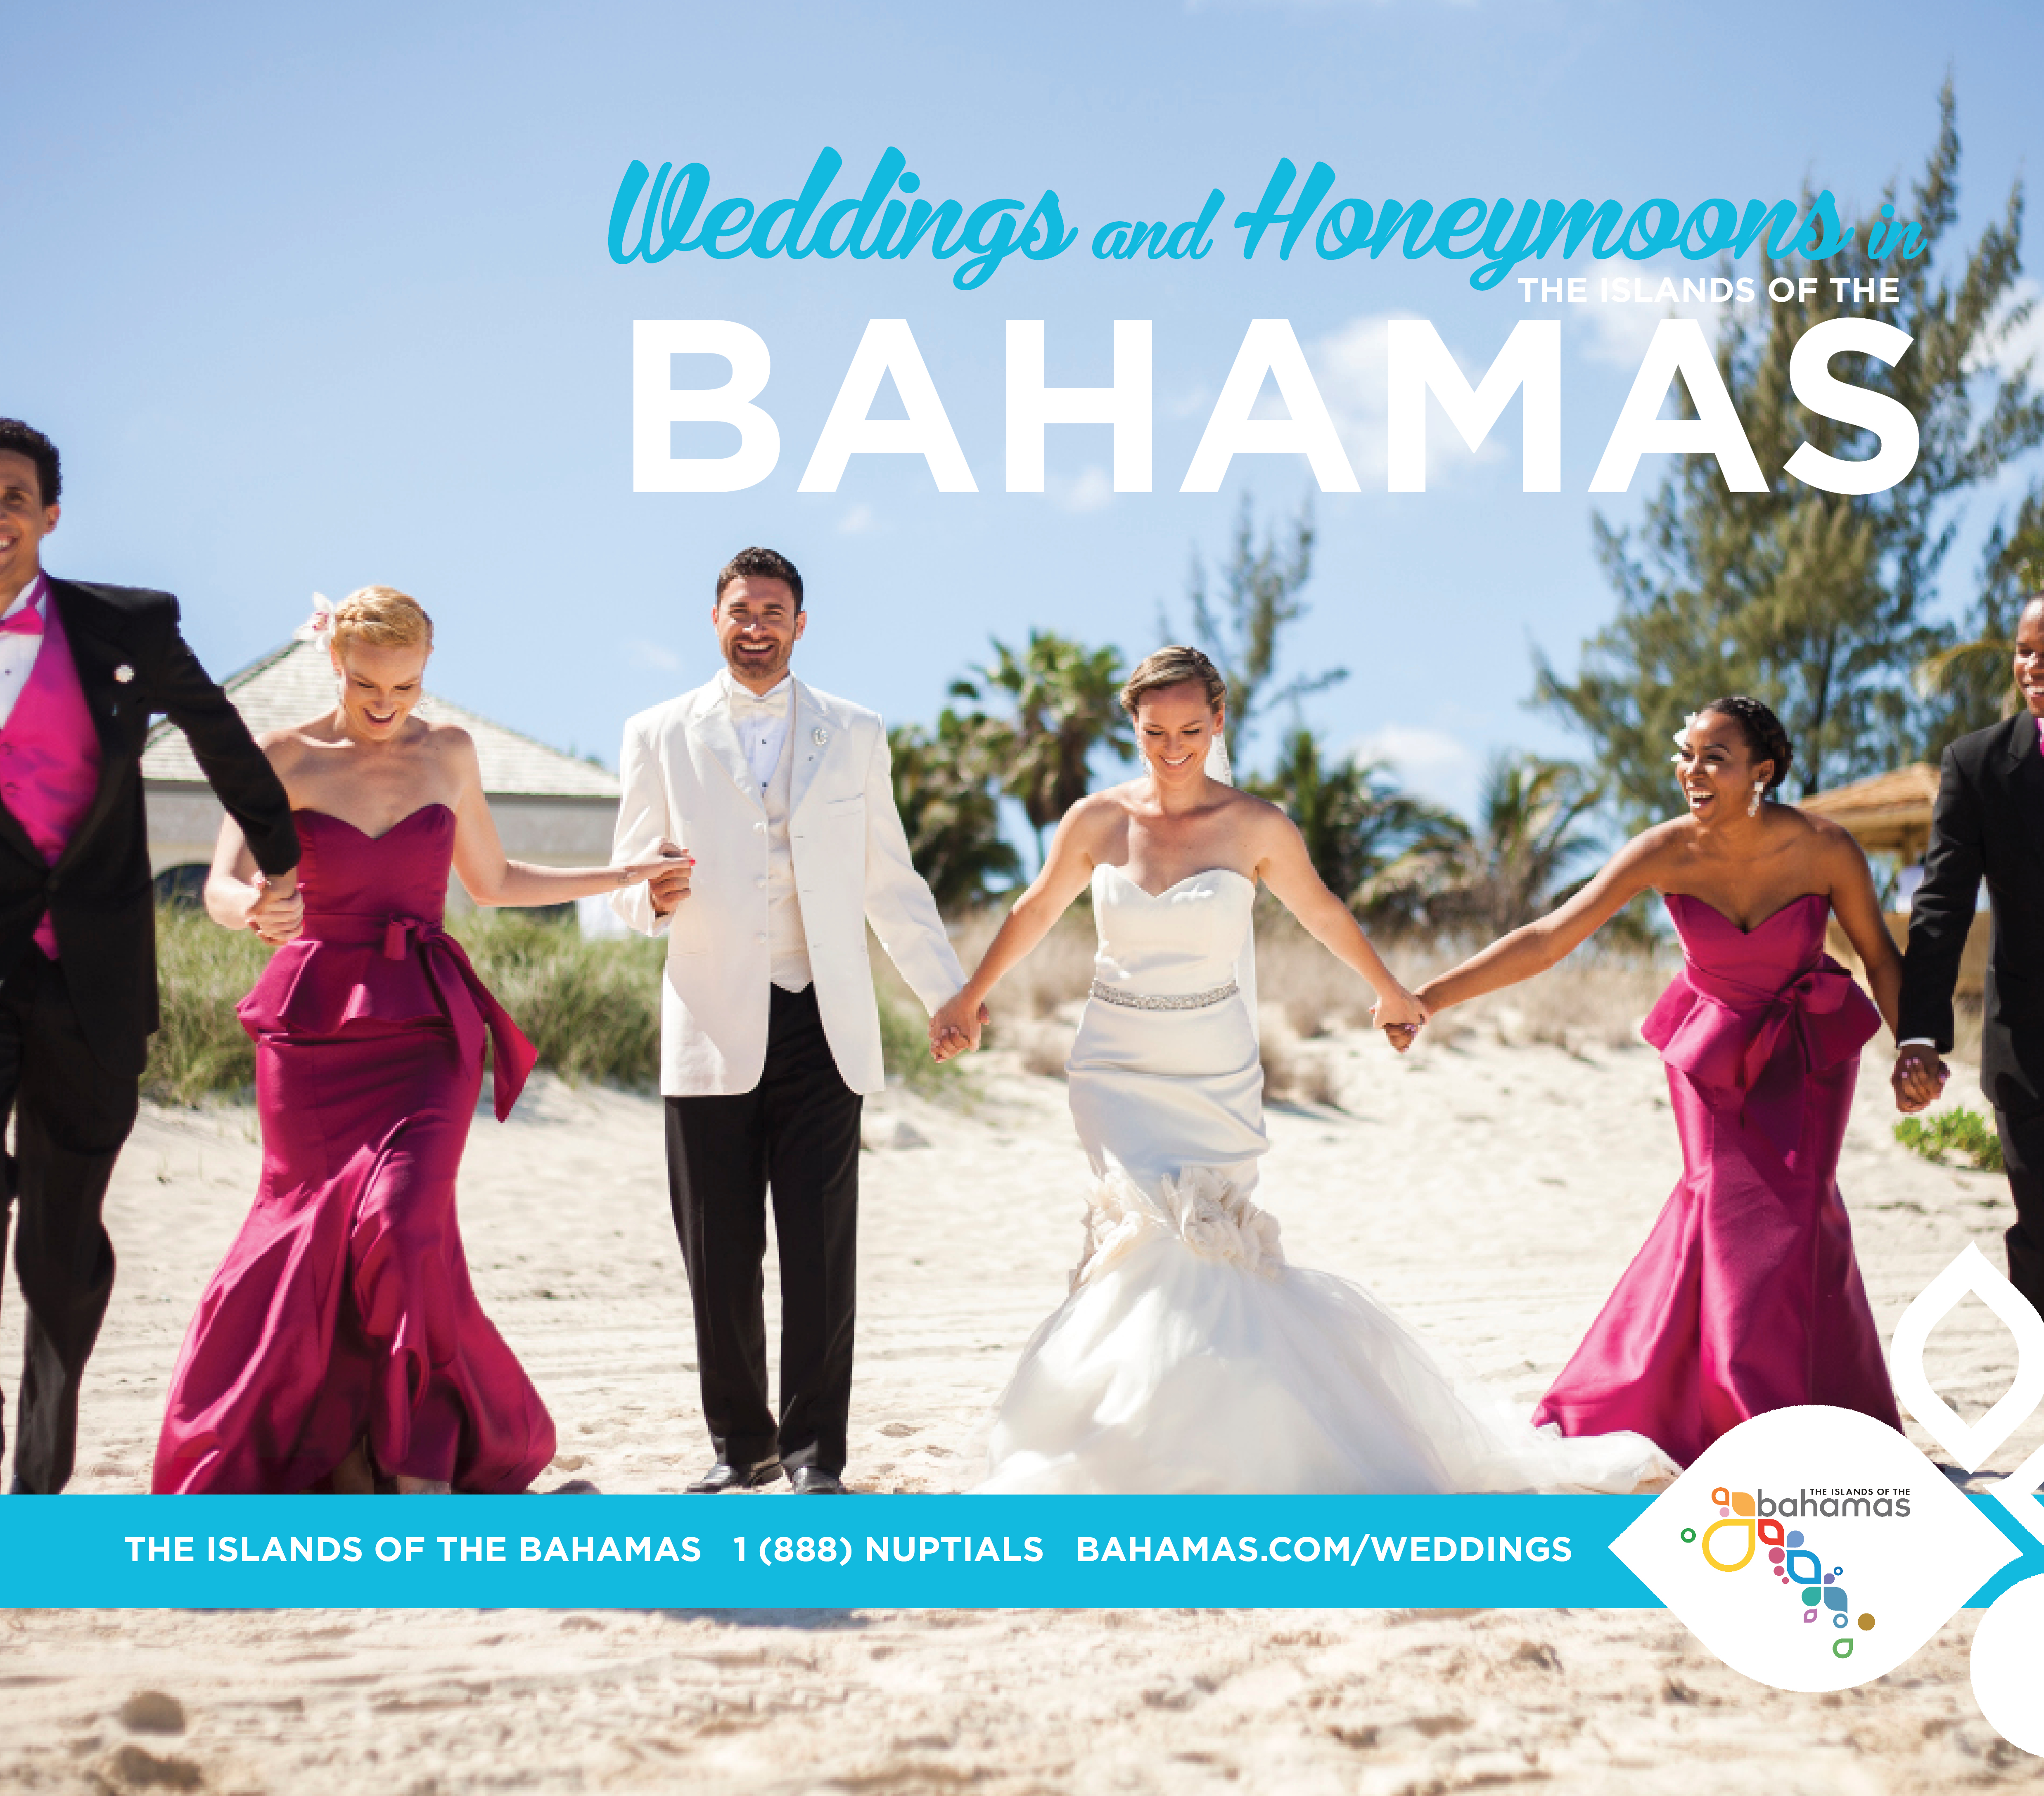 Bahamas Weddings + Honeymoons Brochure